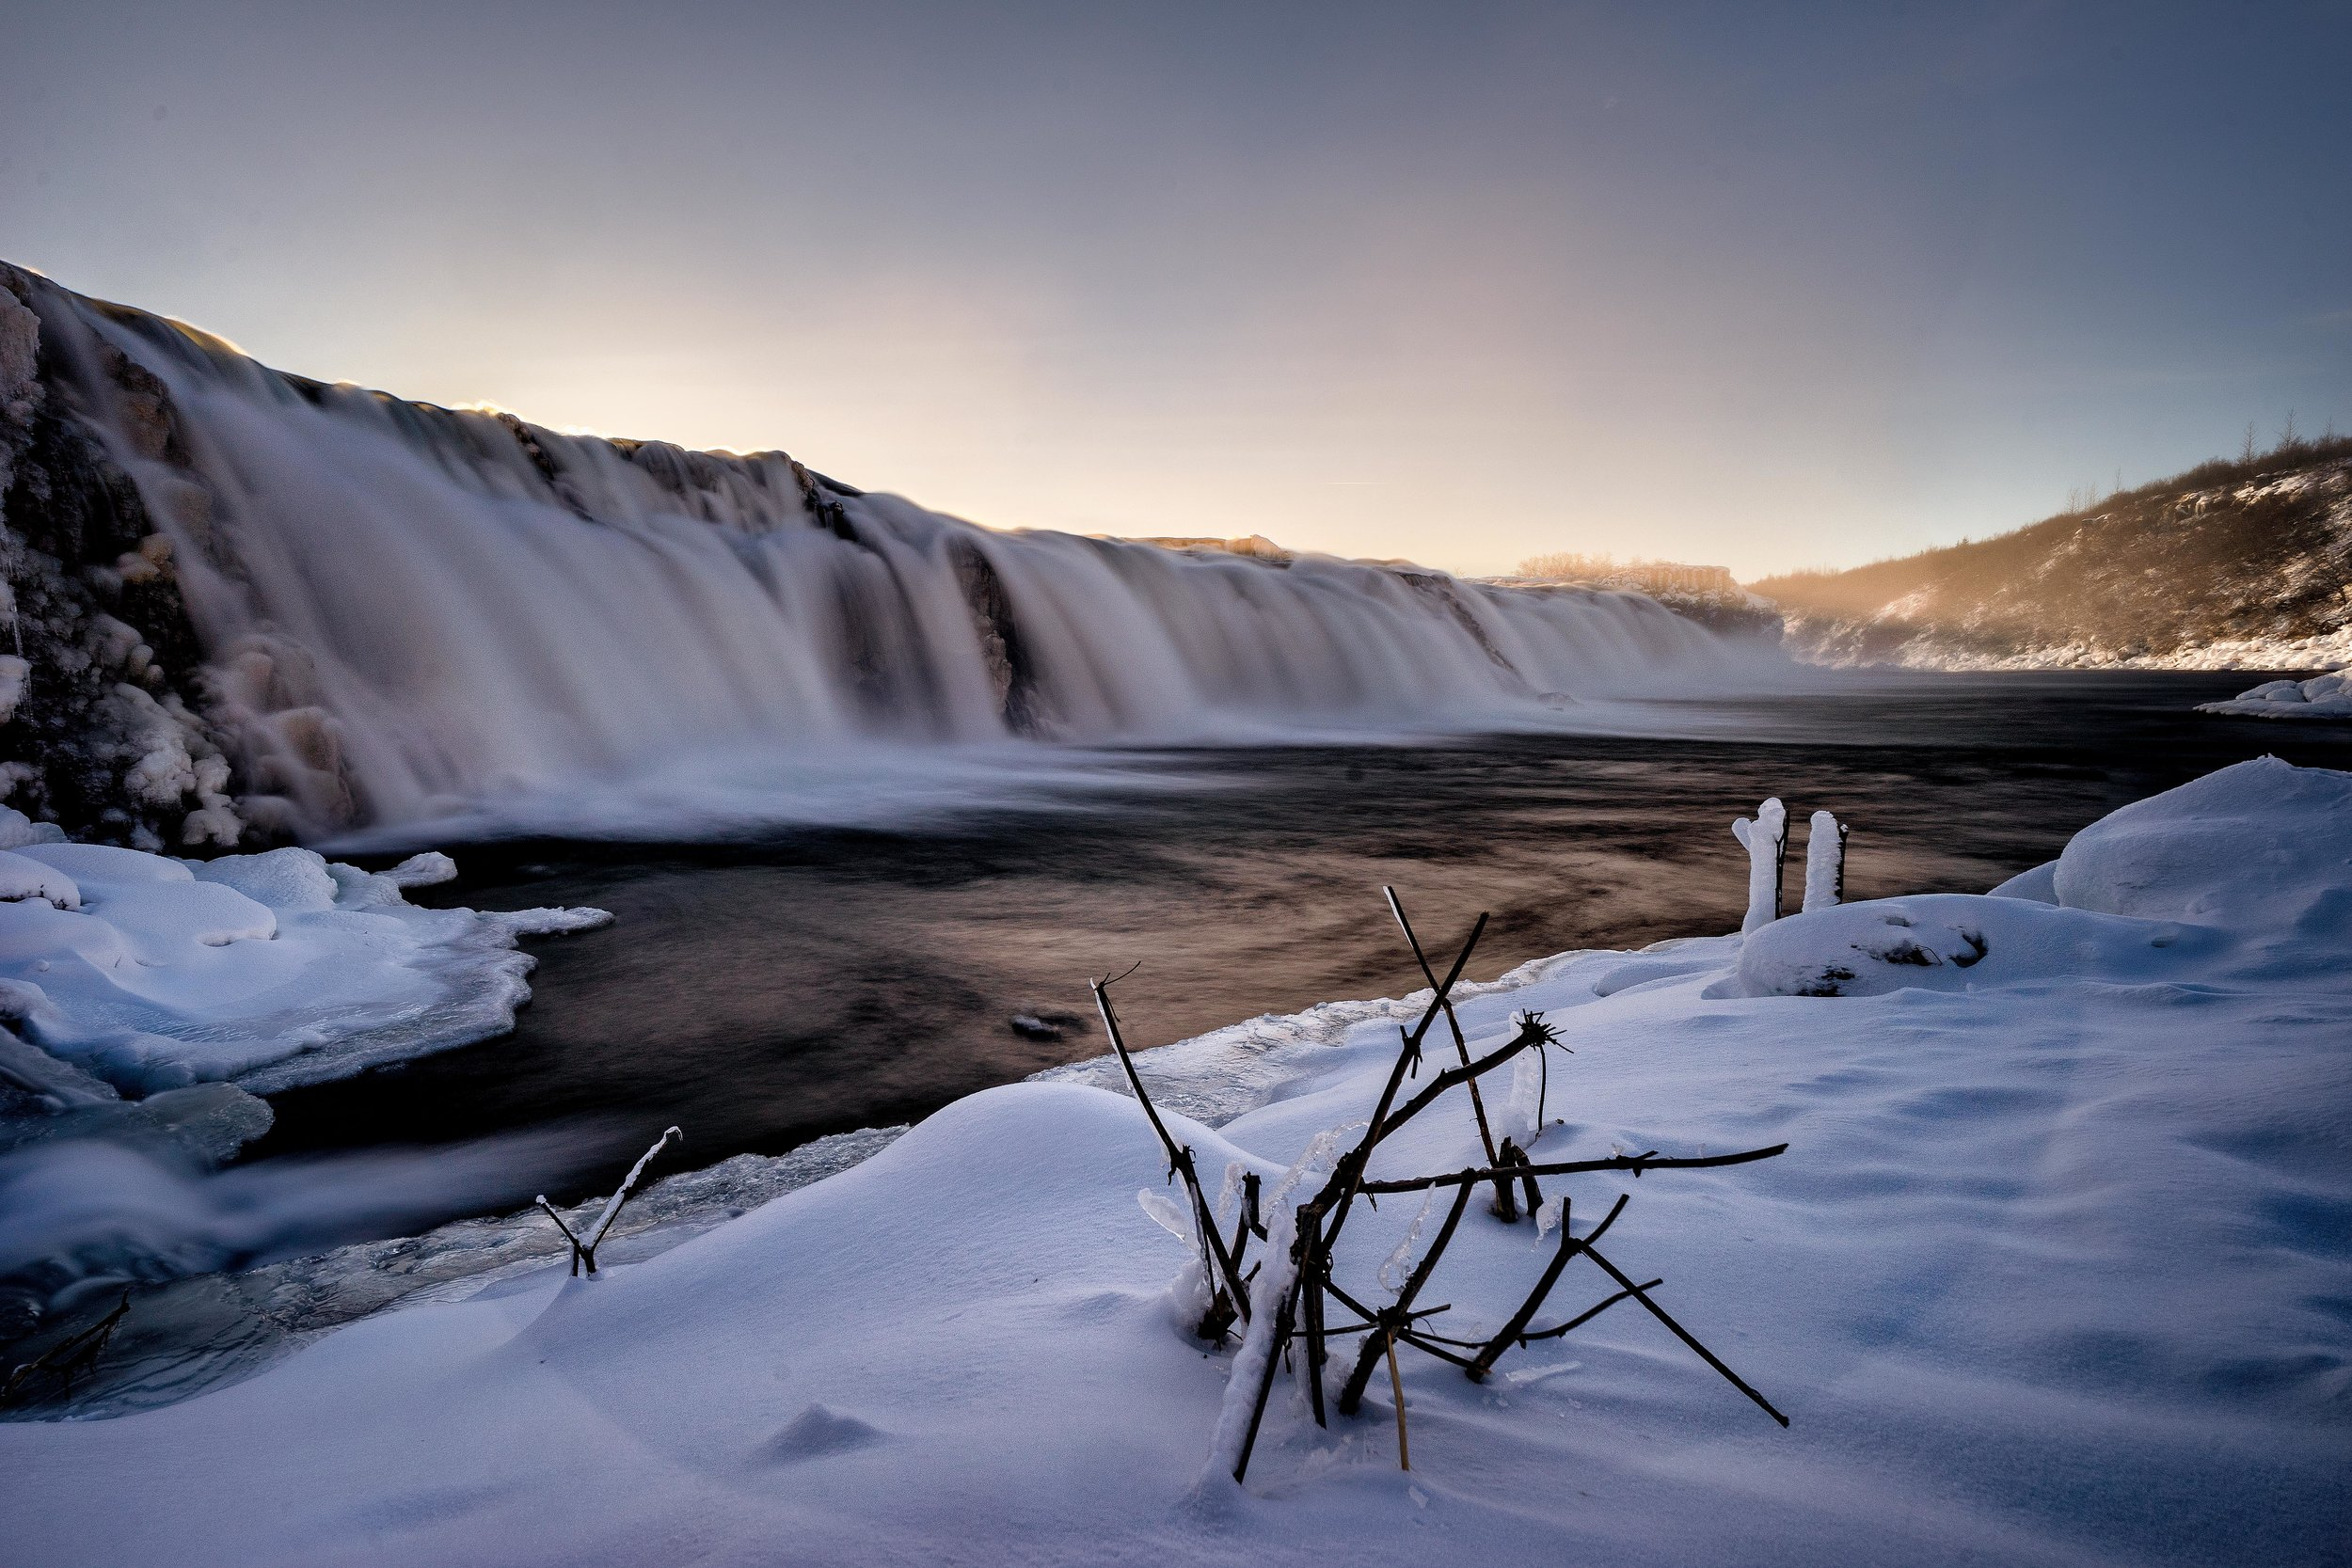 Iceland. snow. travel. adventure. photography. trip. epic landscape. snow. cold. freezing. sunrise. faxifoss. long exposure.jpg